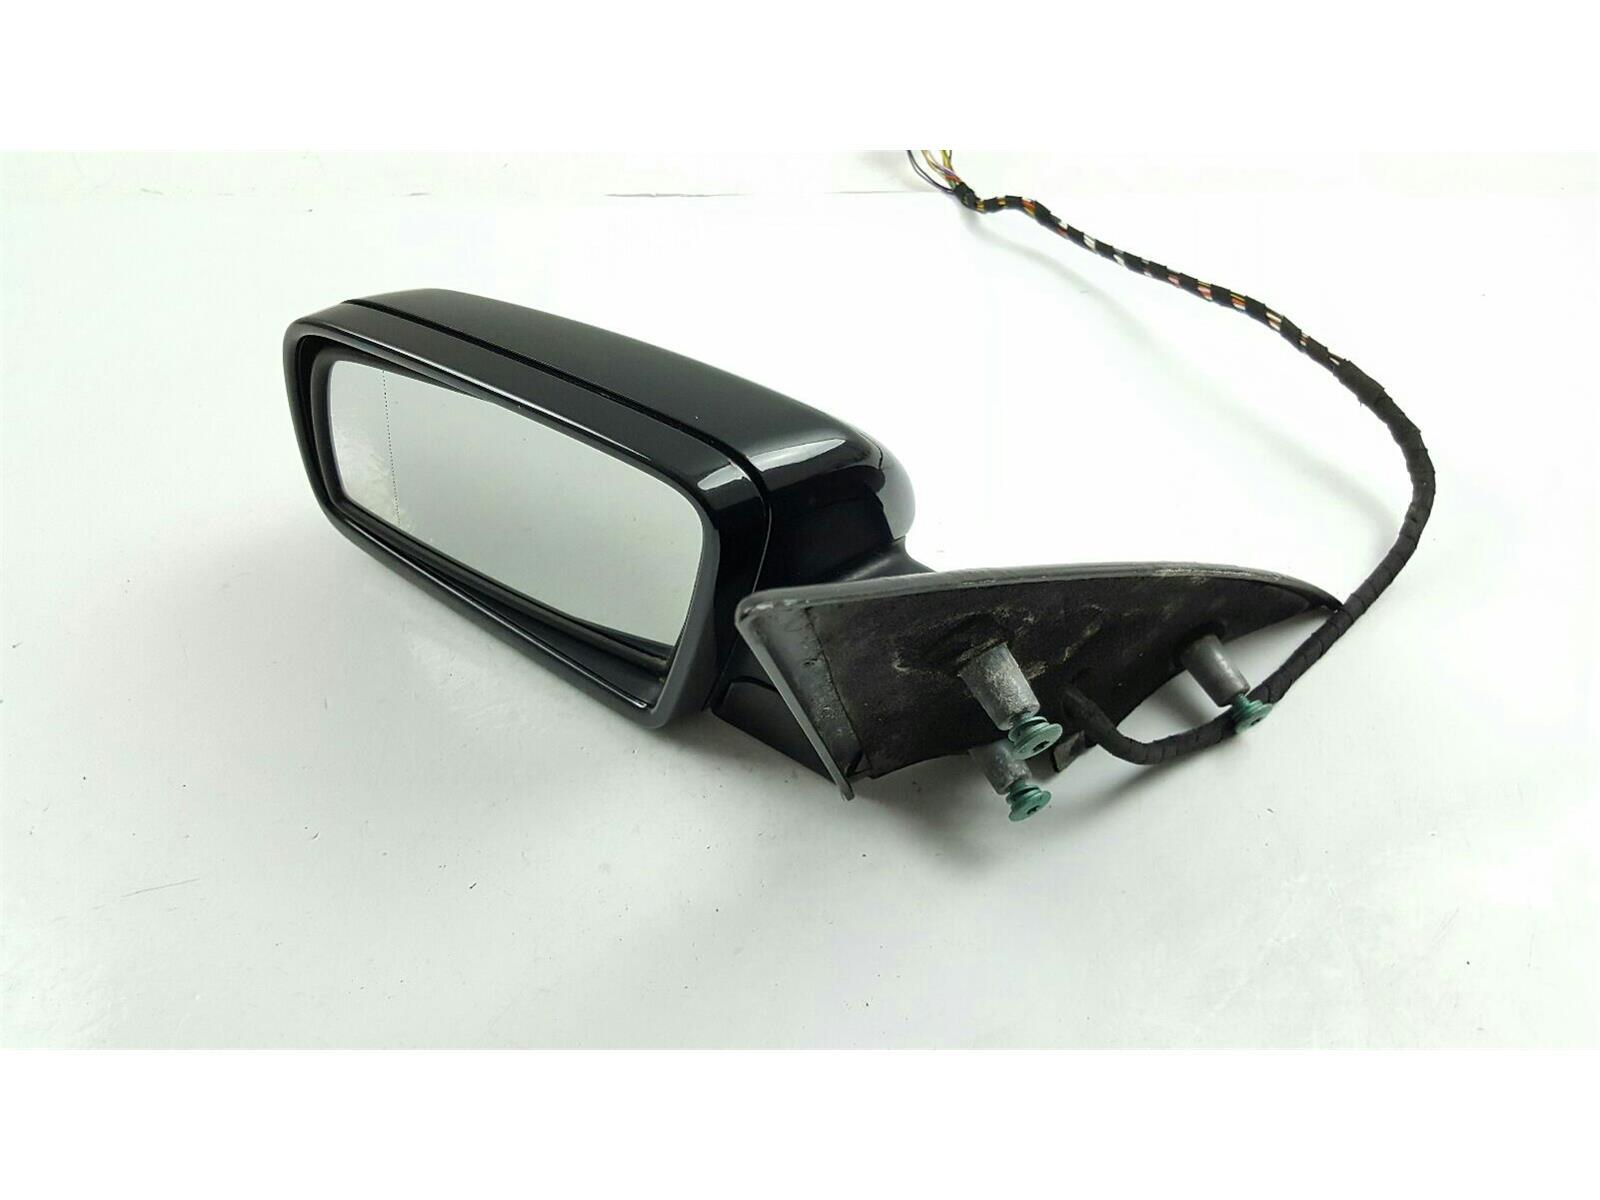 eyewear c shoes bmw m s sunglasses men accessories clothing fashion